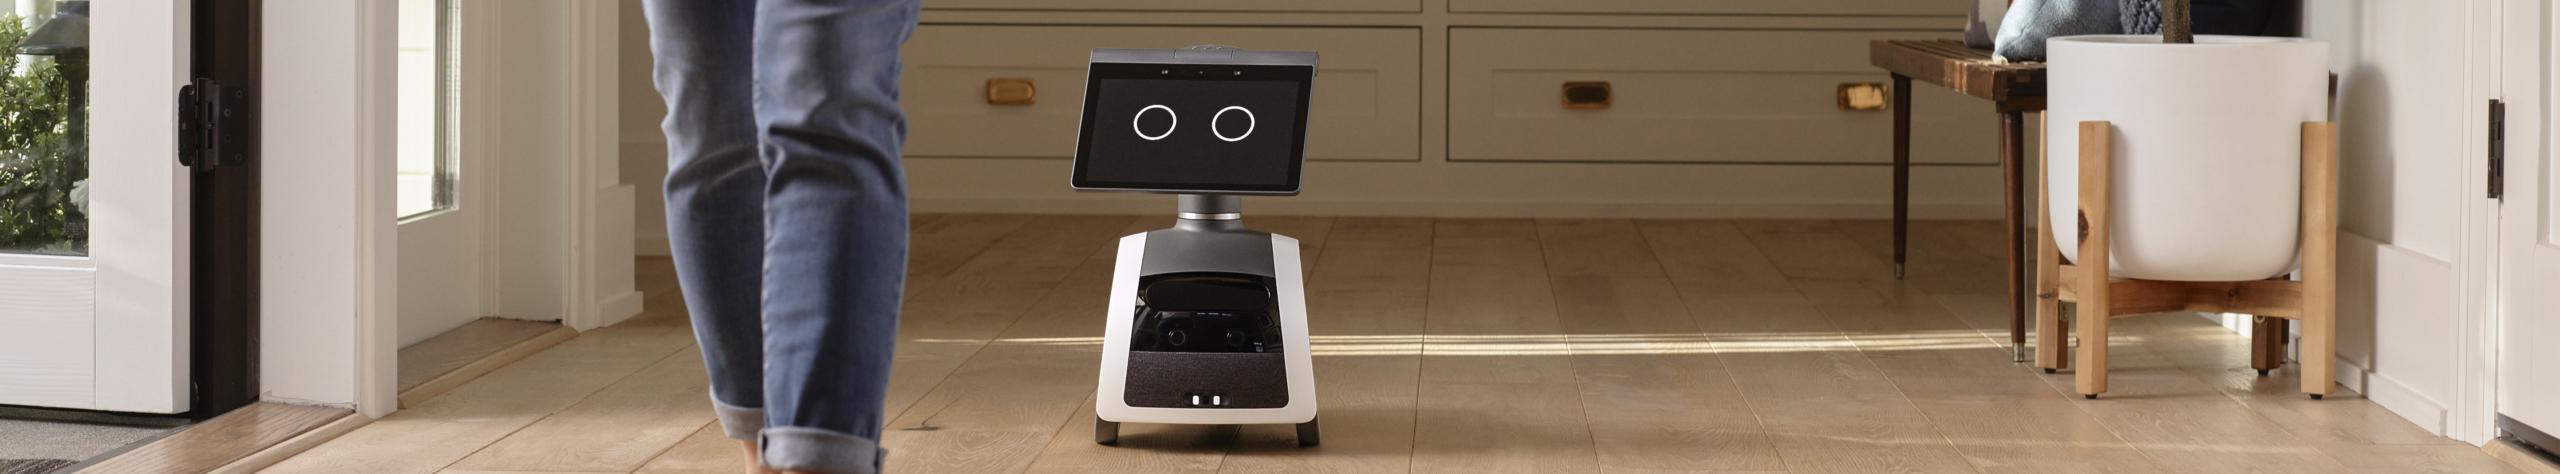 astro haushaltsroboter haushalt roboter